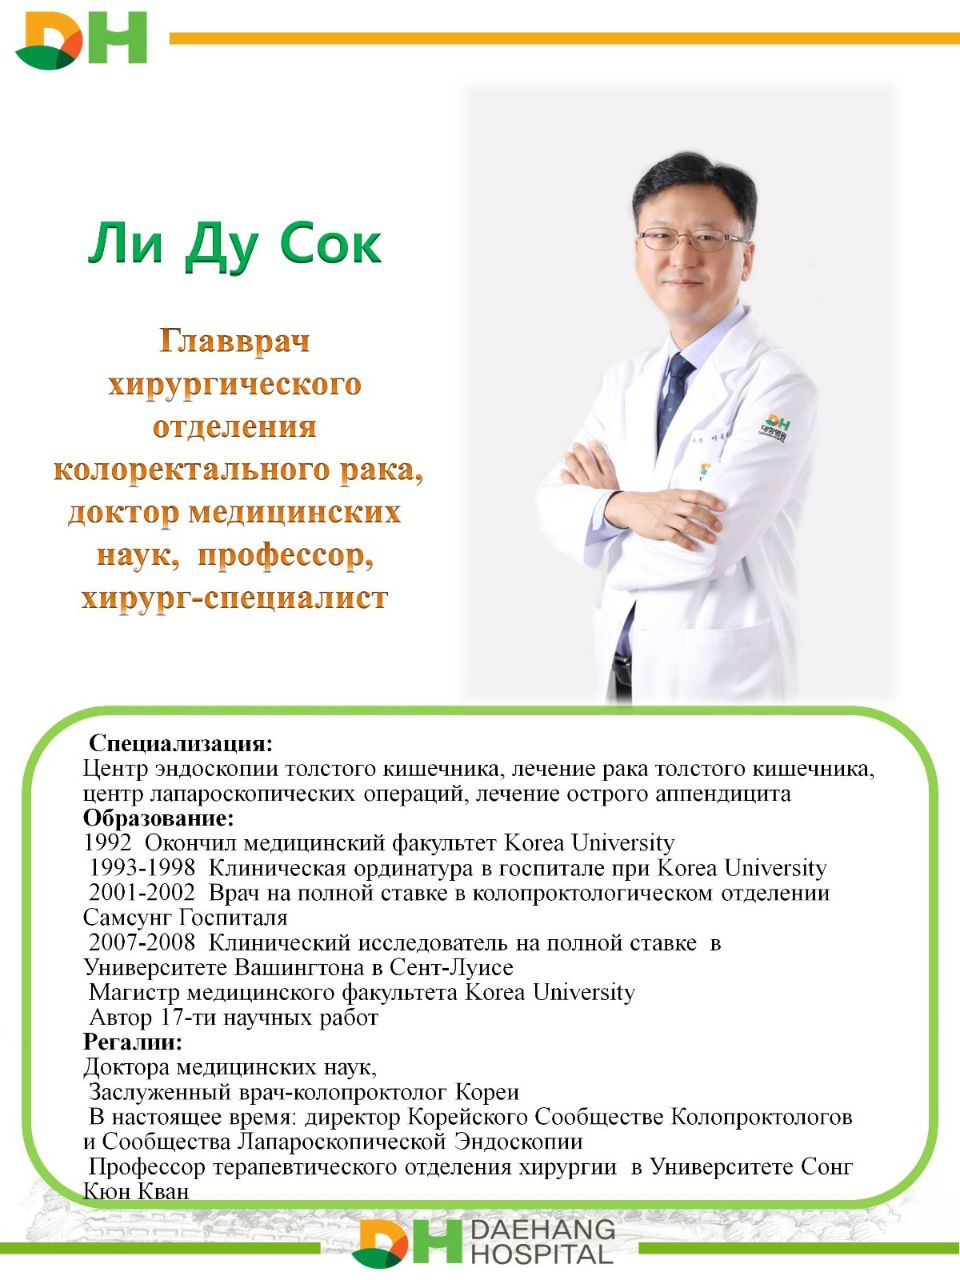 профессор Ли Ду Сок